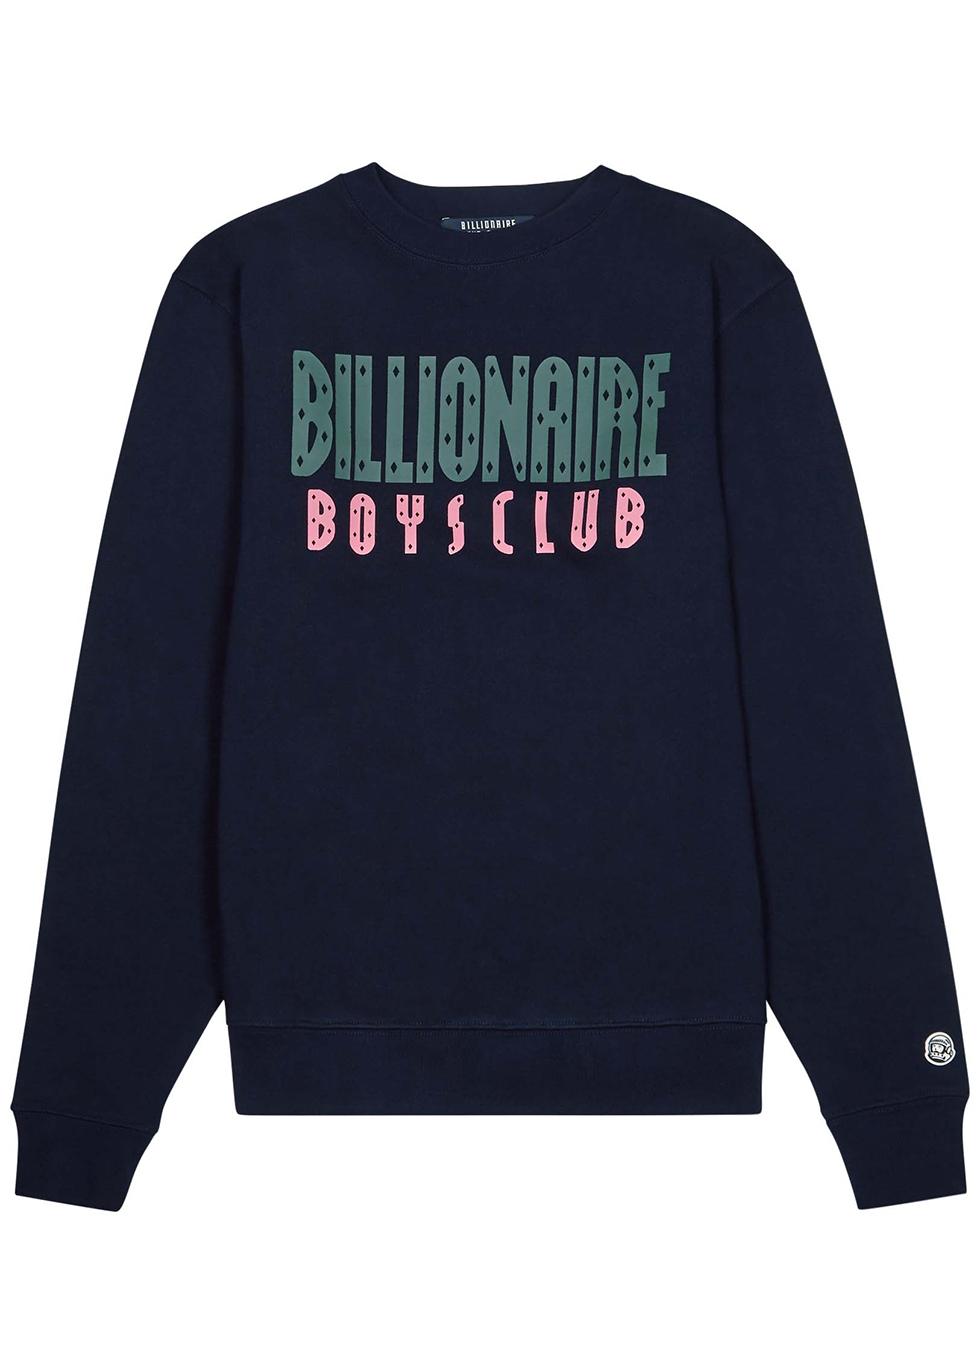 Navy logo-print cotton sweatshirt